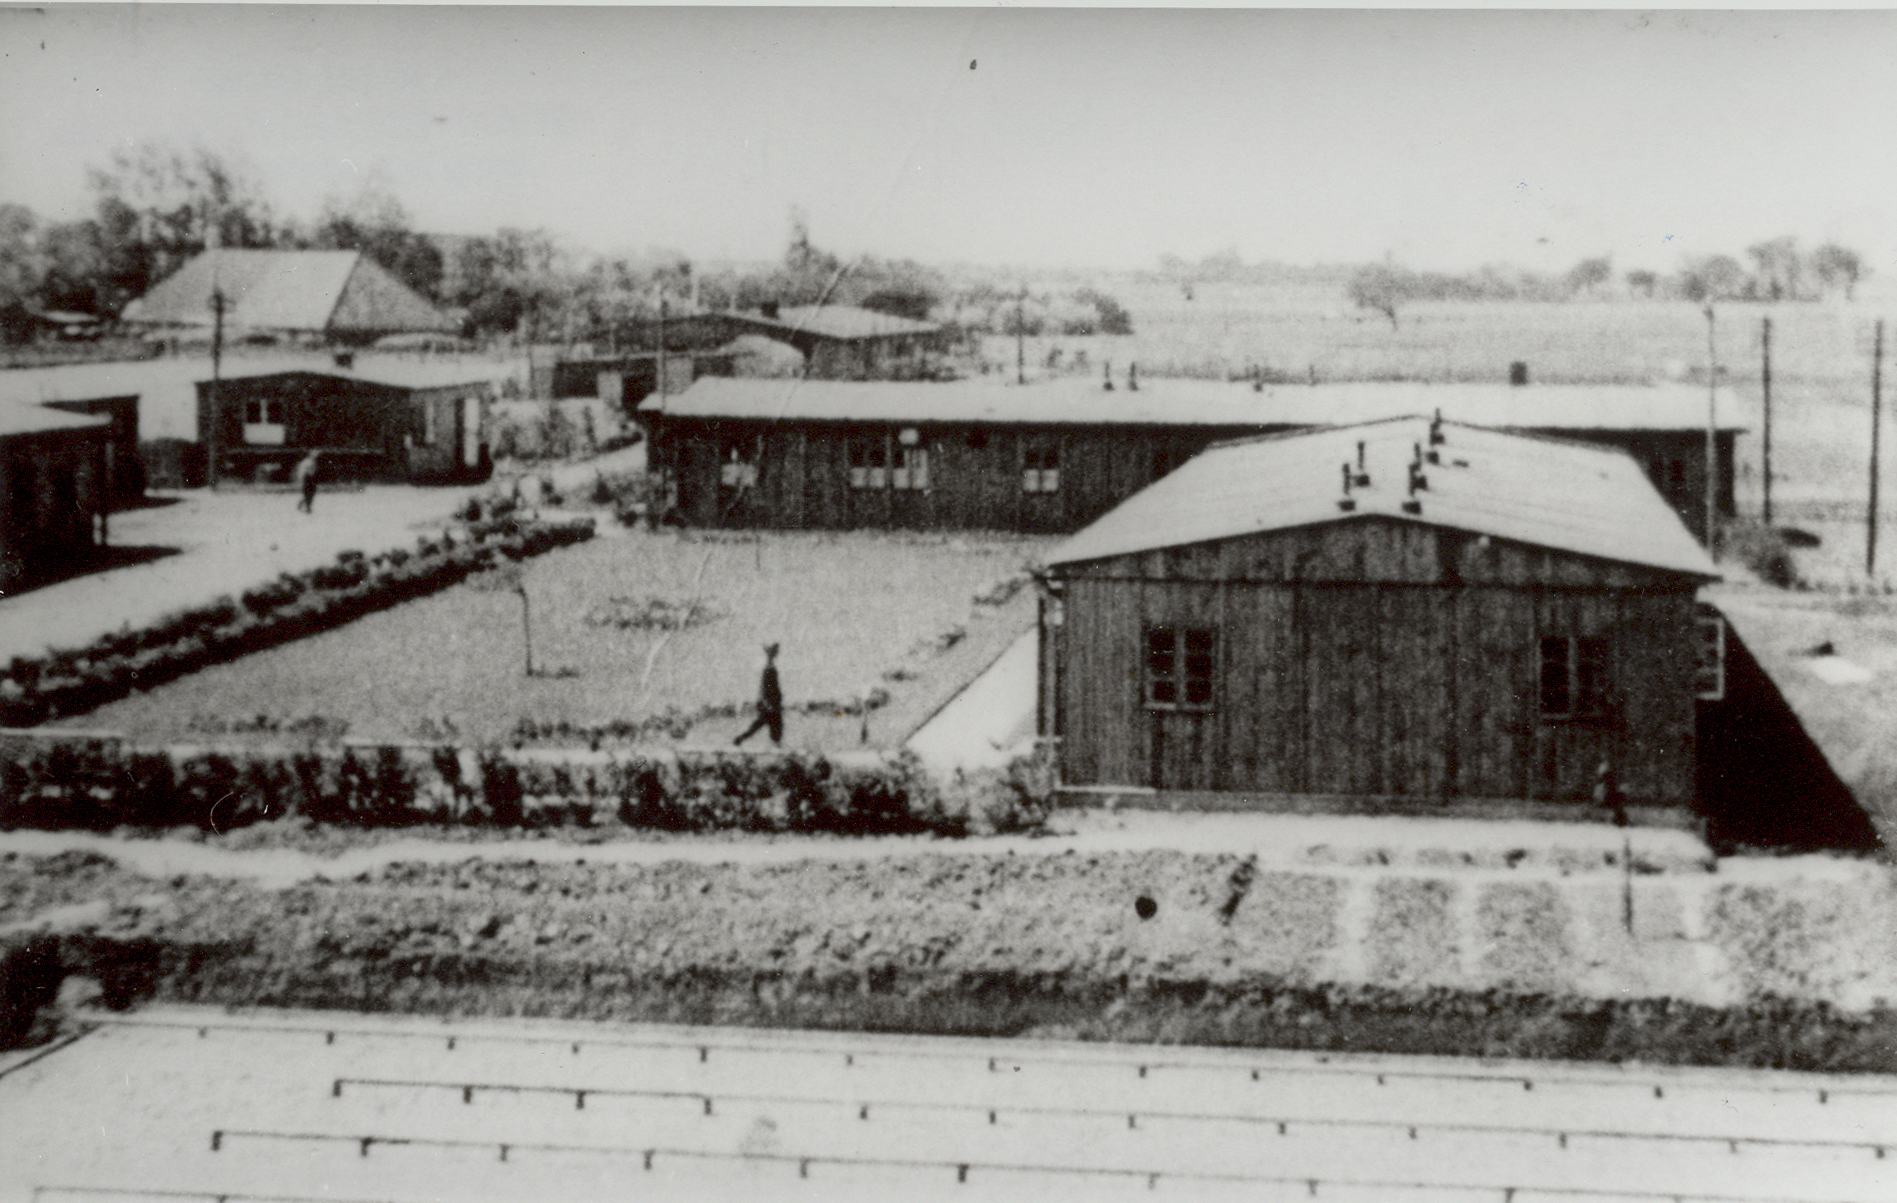 Batterie Nansum WWII -Militaire Barakken